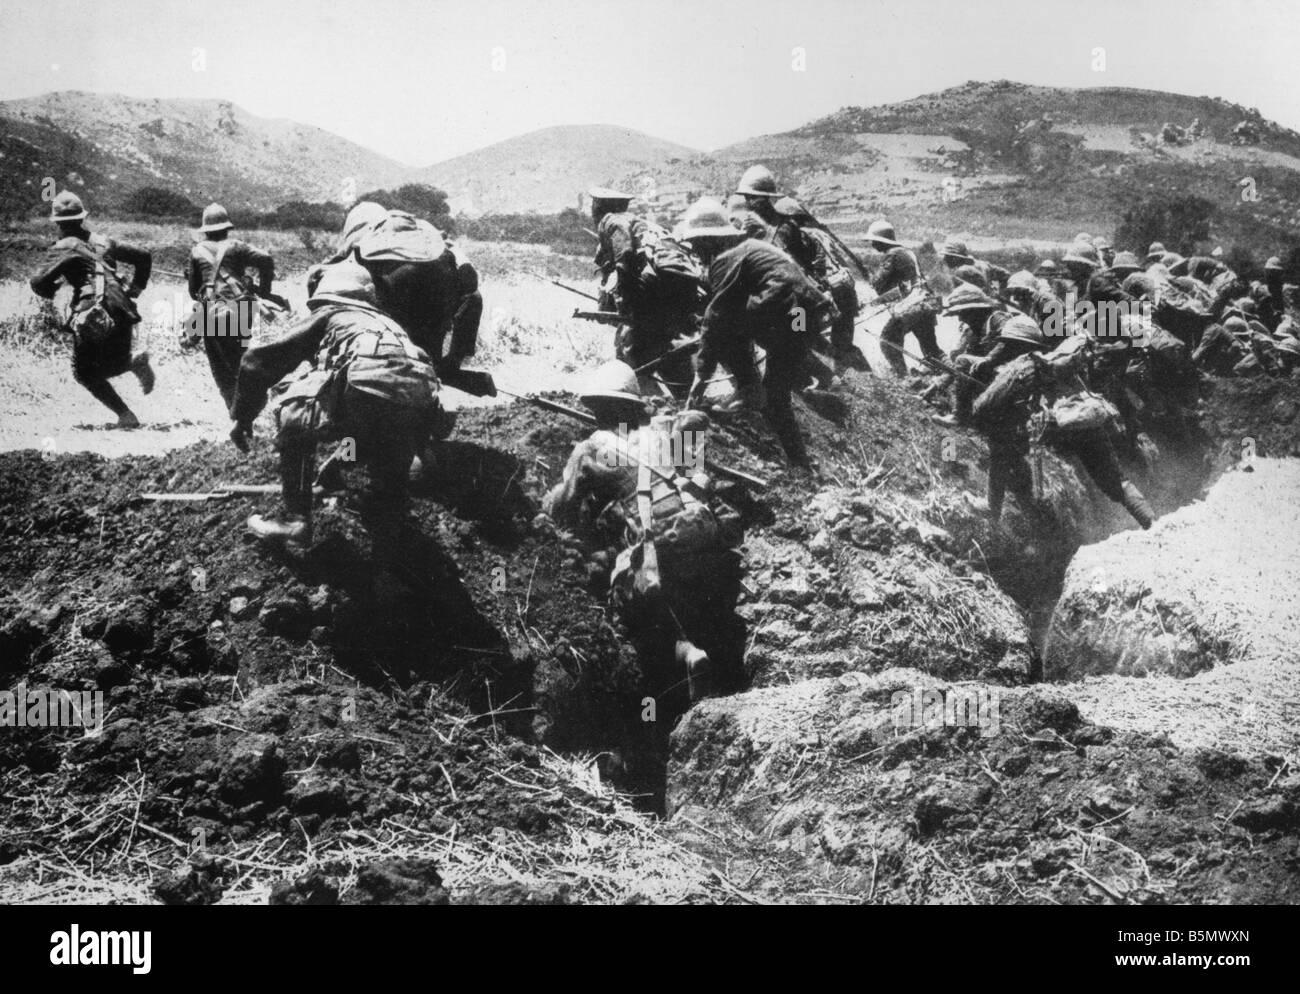 9tk 4 25 A1 1 Battle For Gallipoli Photo World